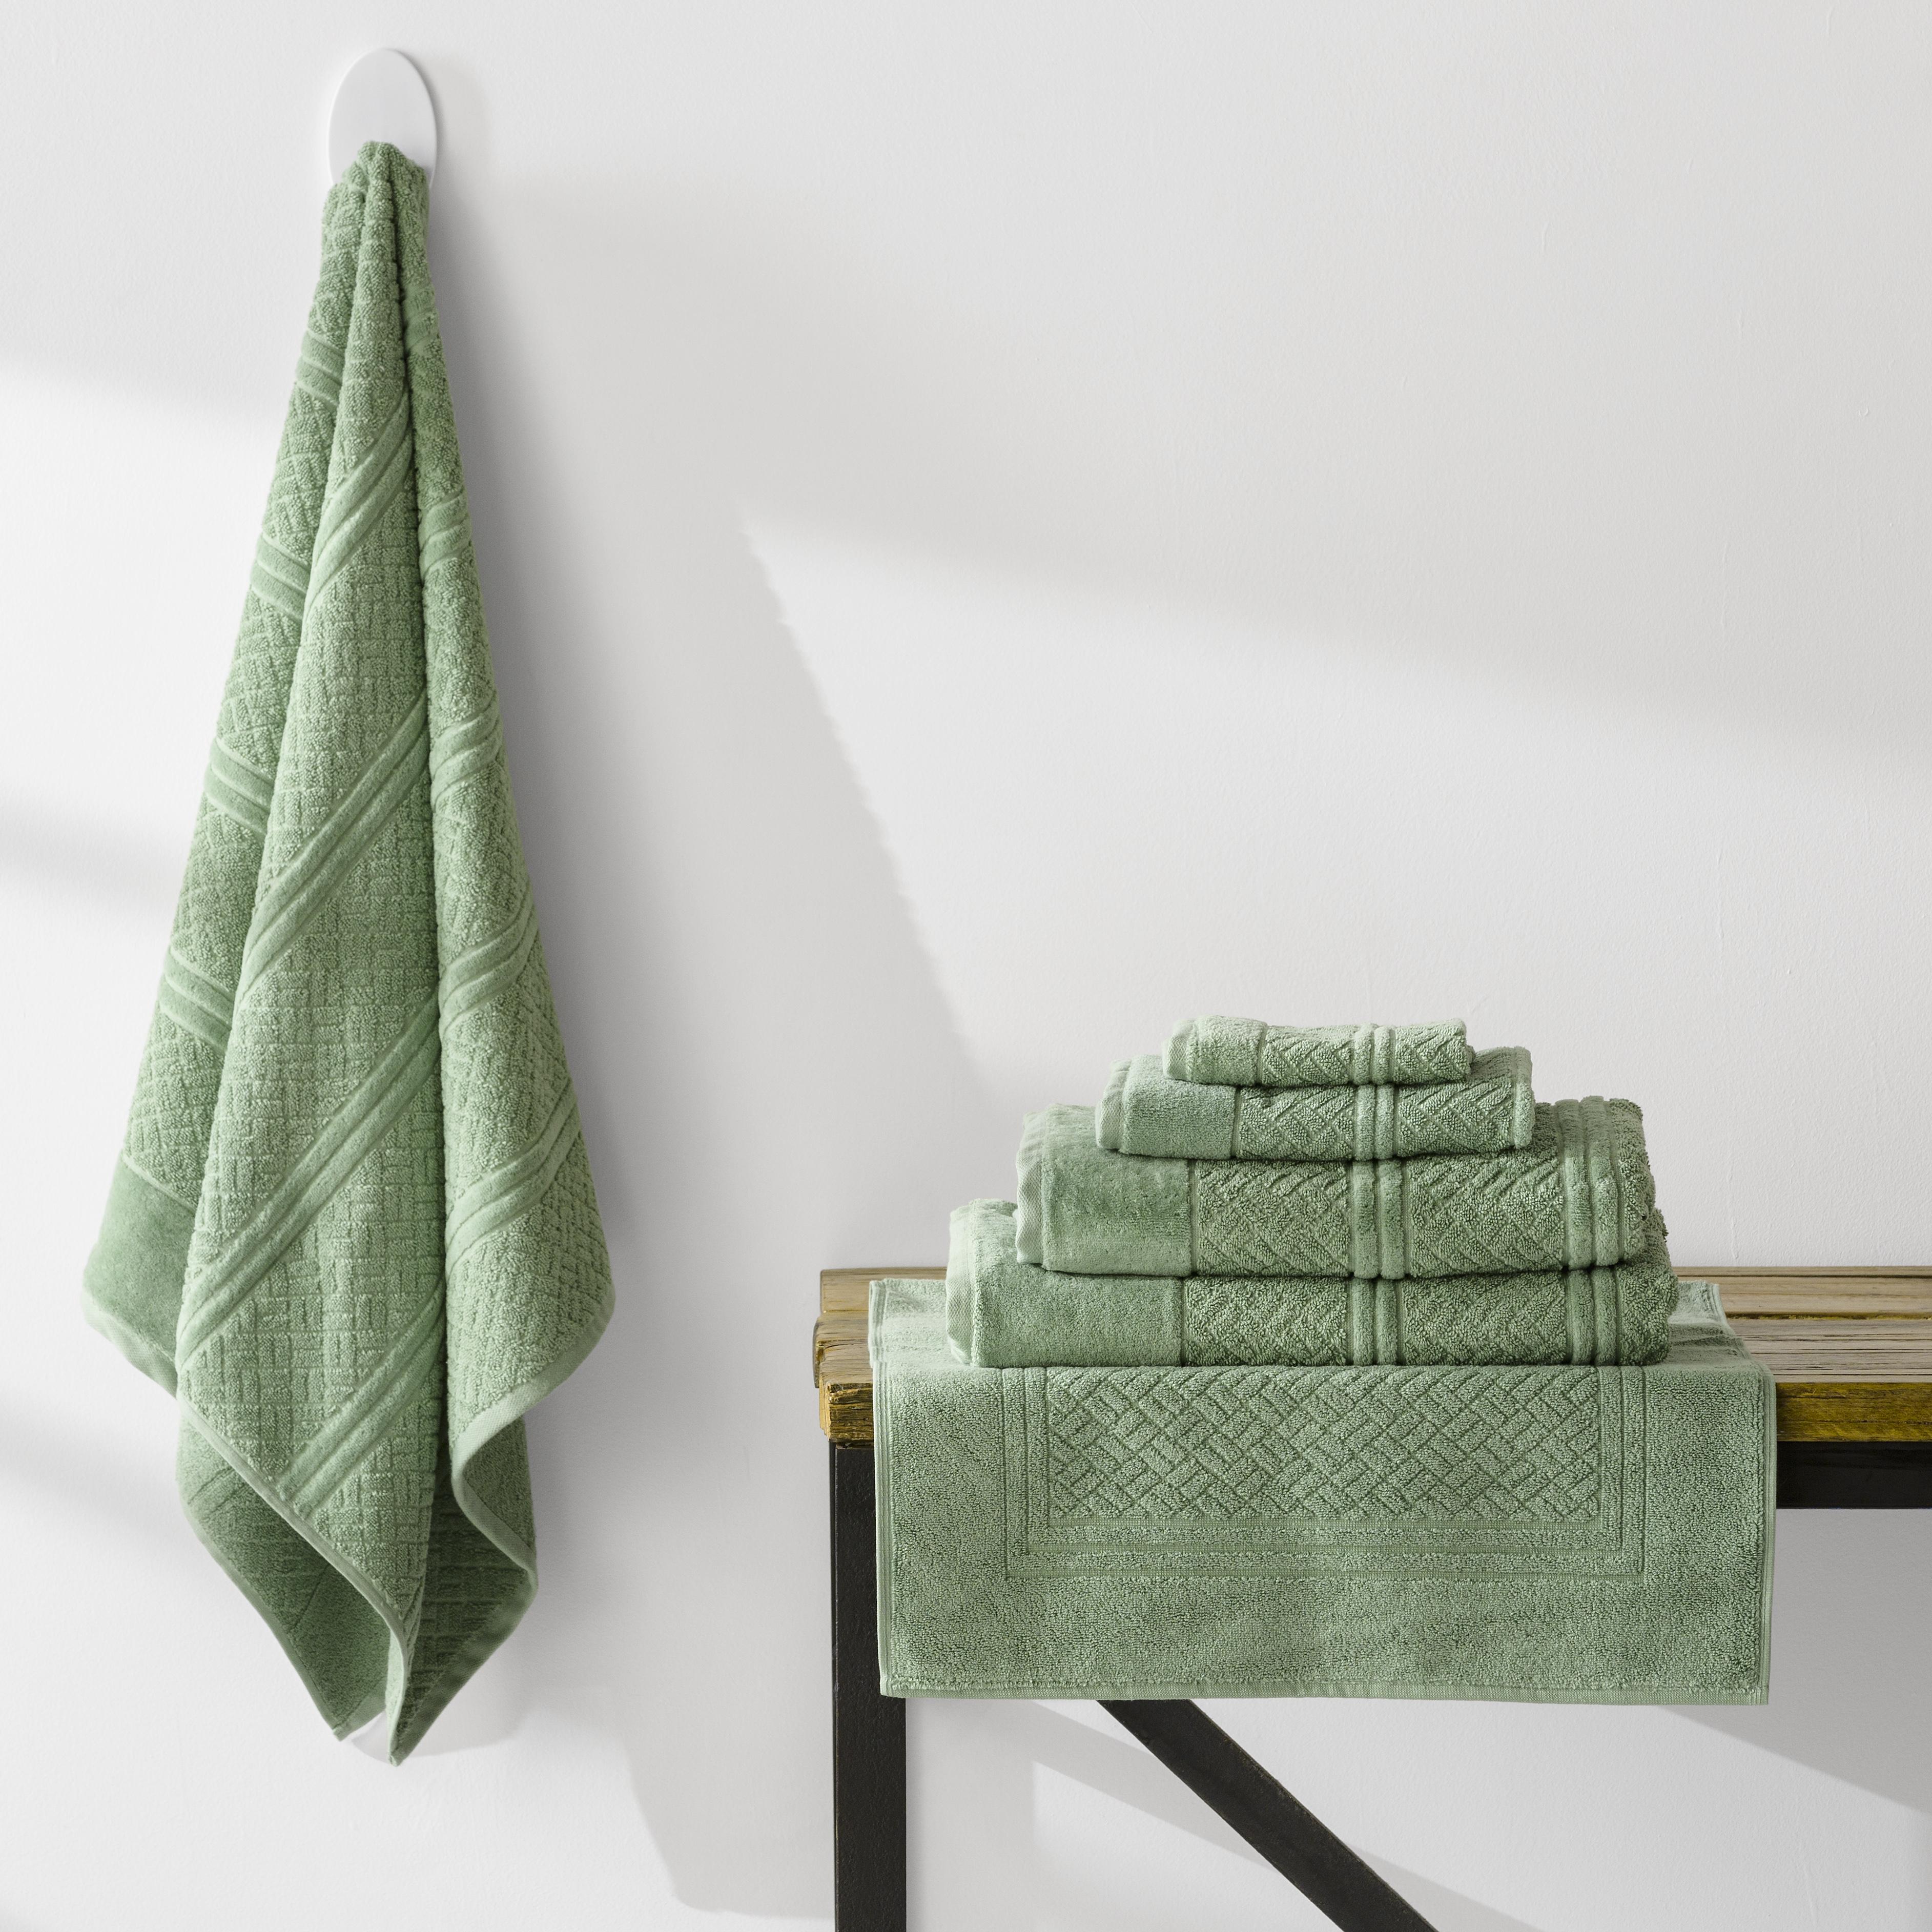 Turkish Cotton Towels Jaquard  Weave   Basil